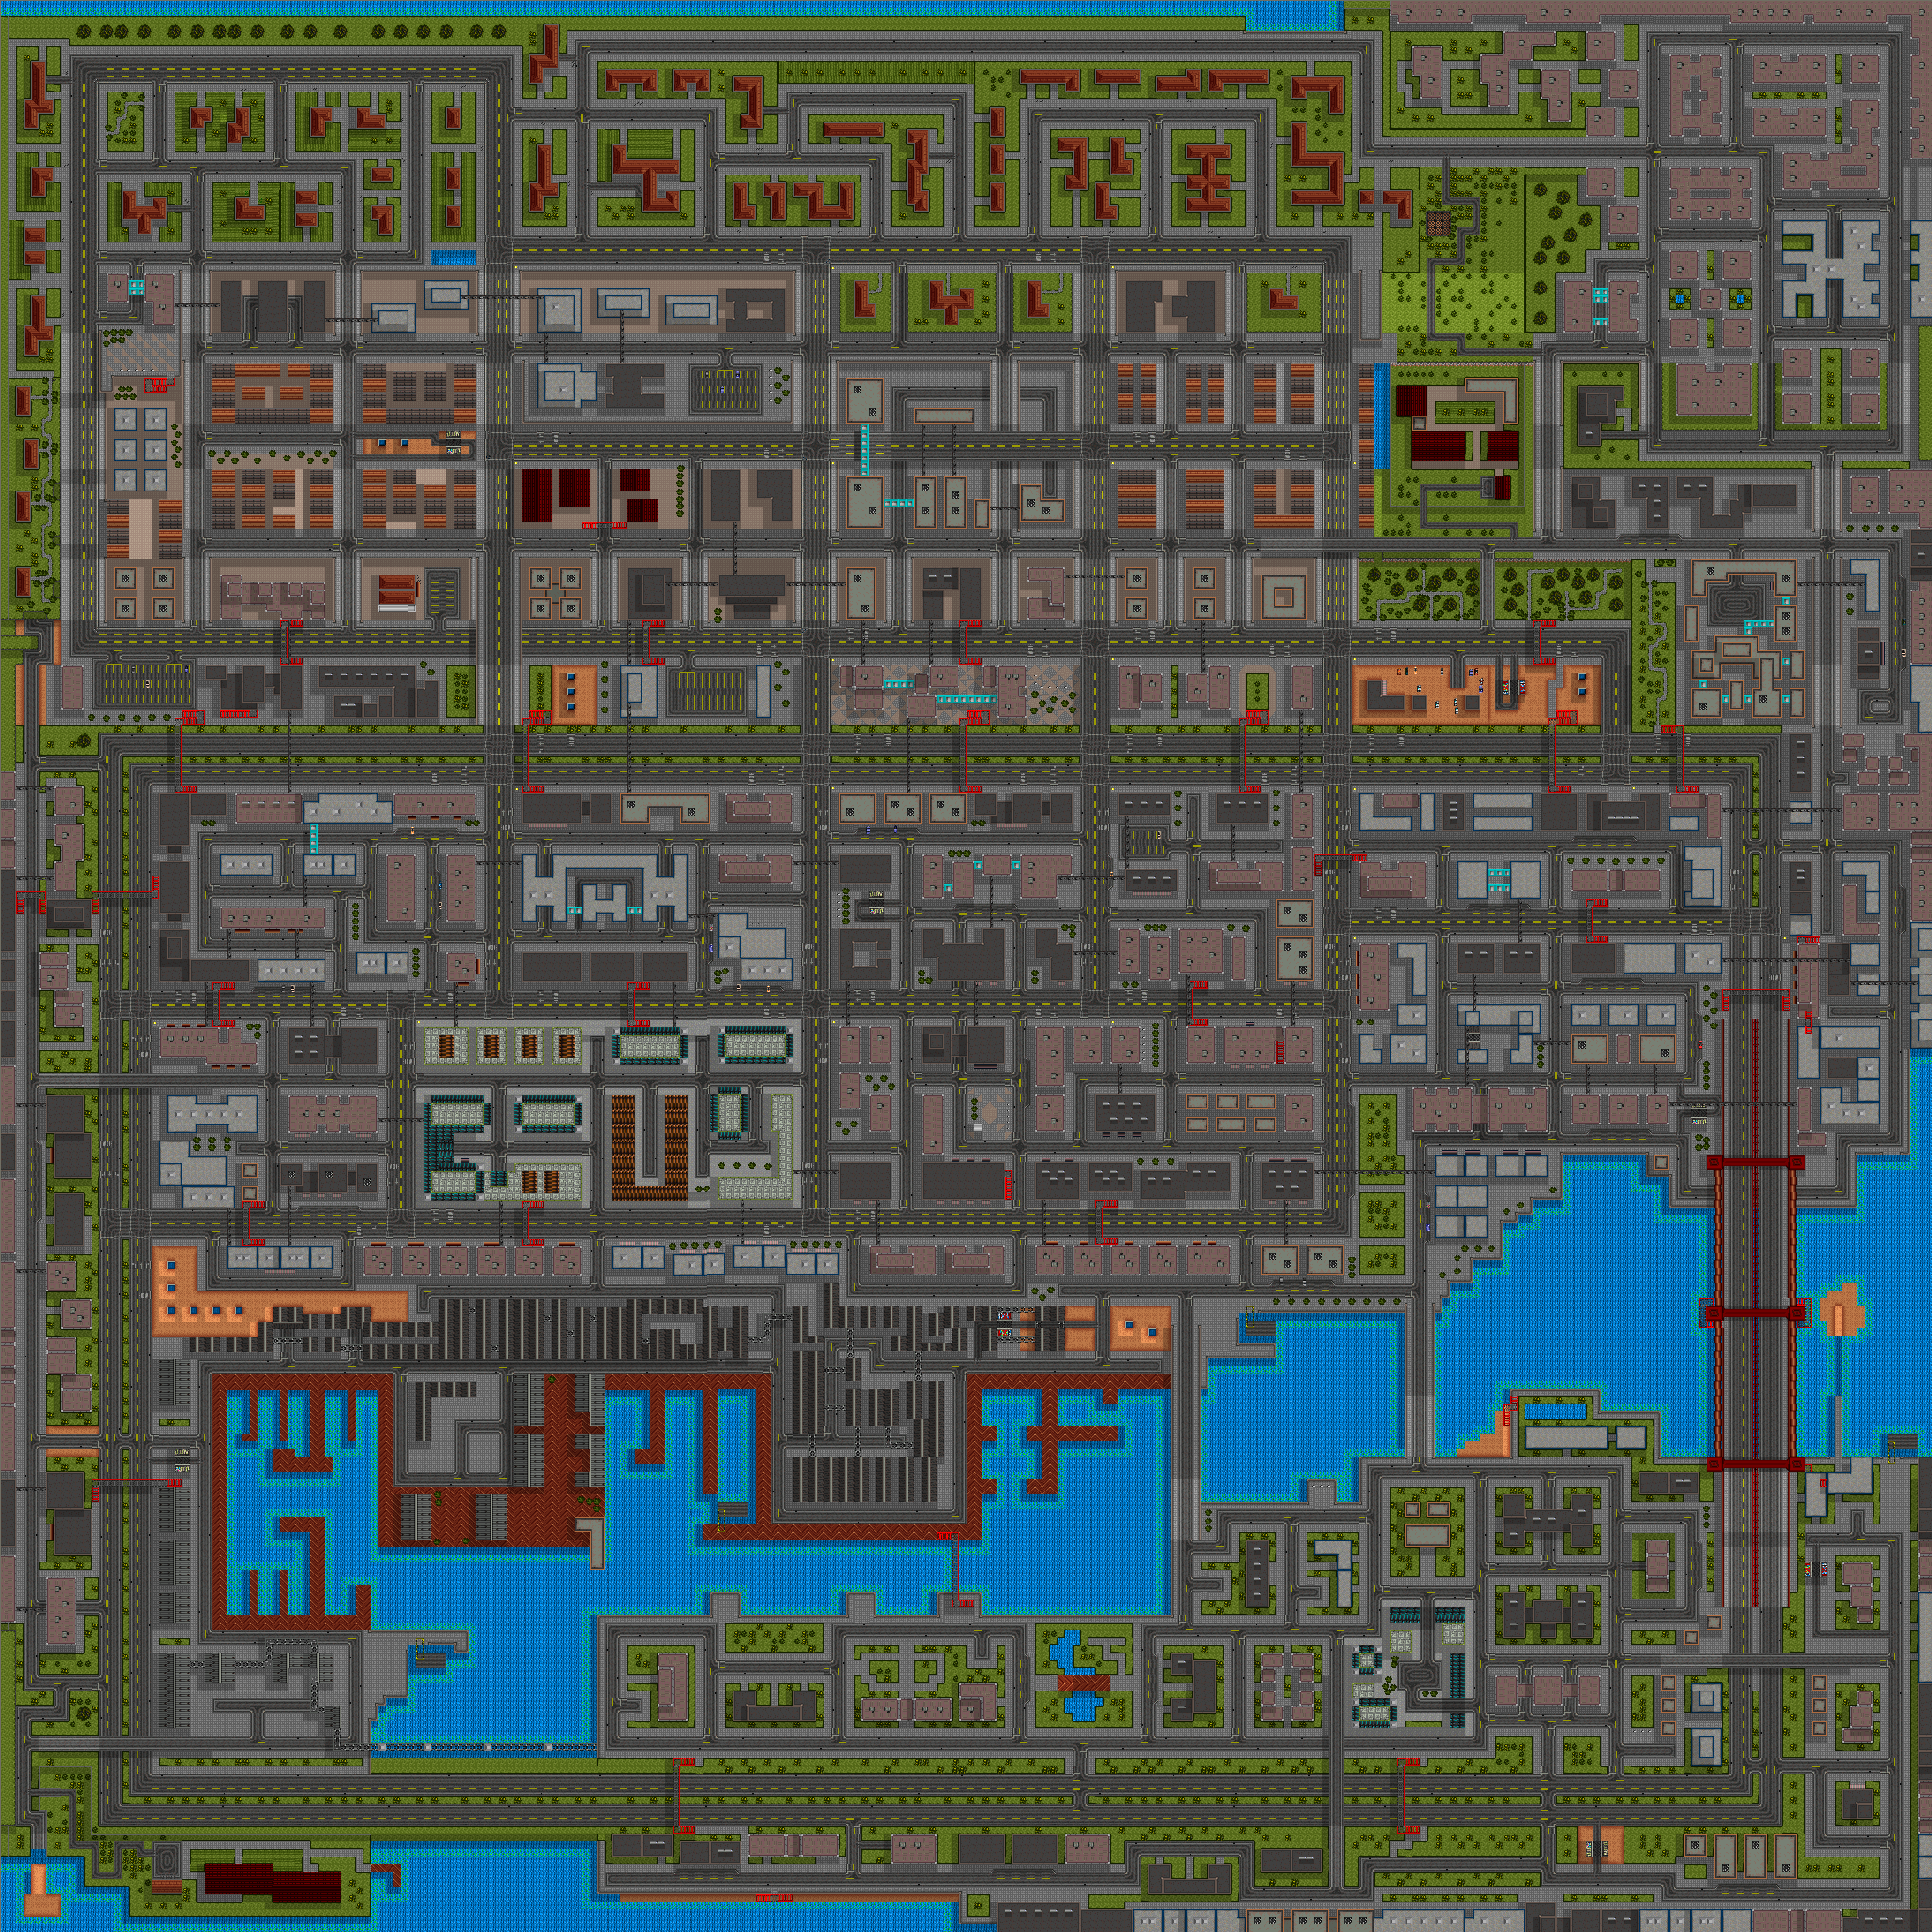 GTA San Andreas Map